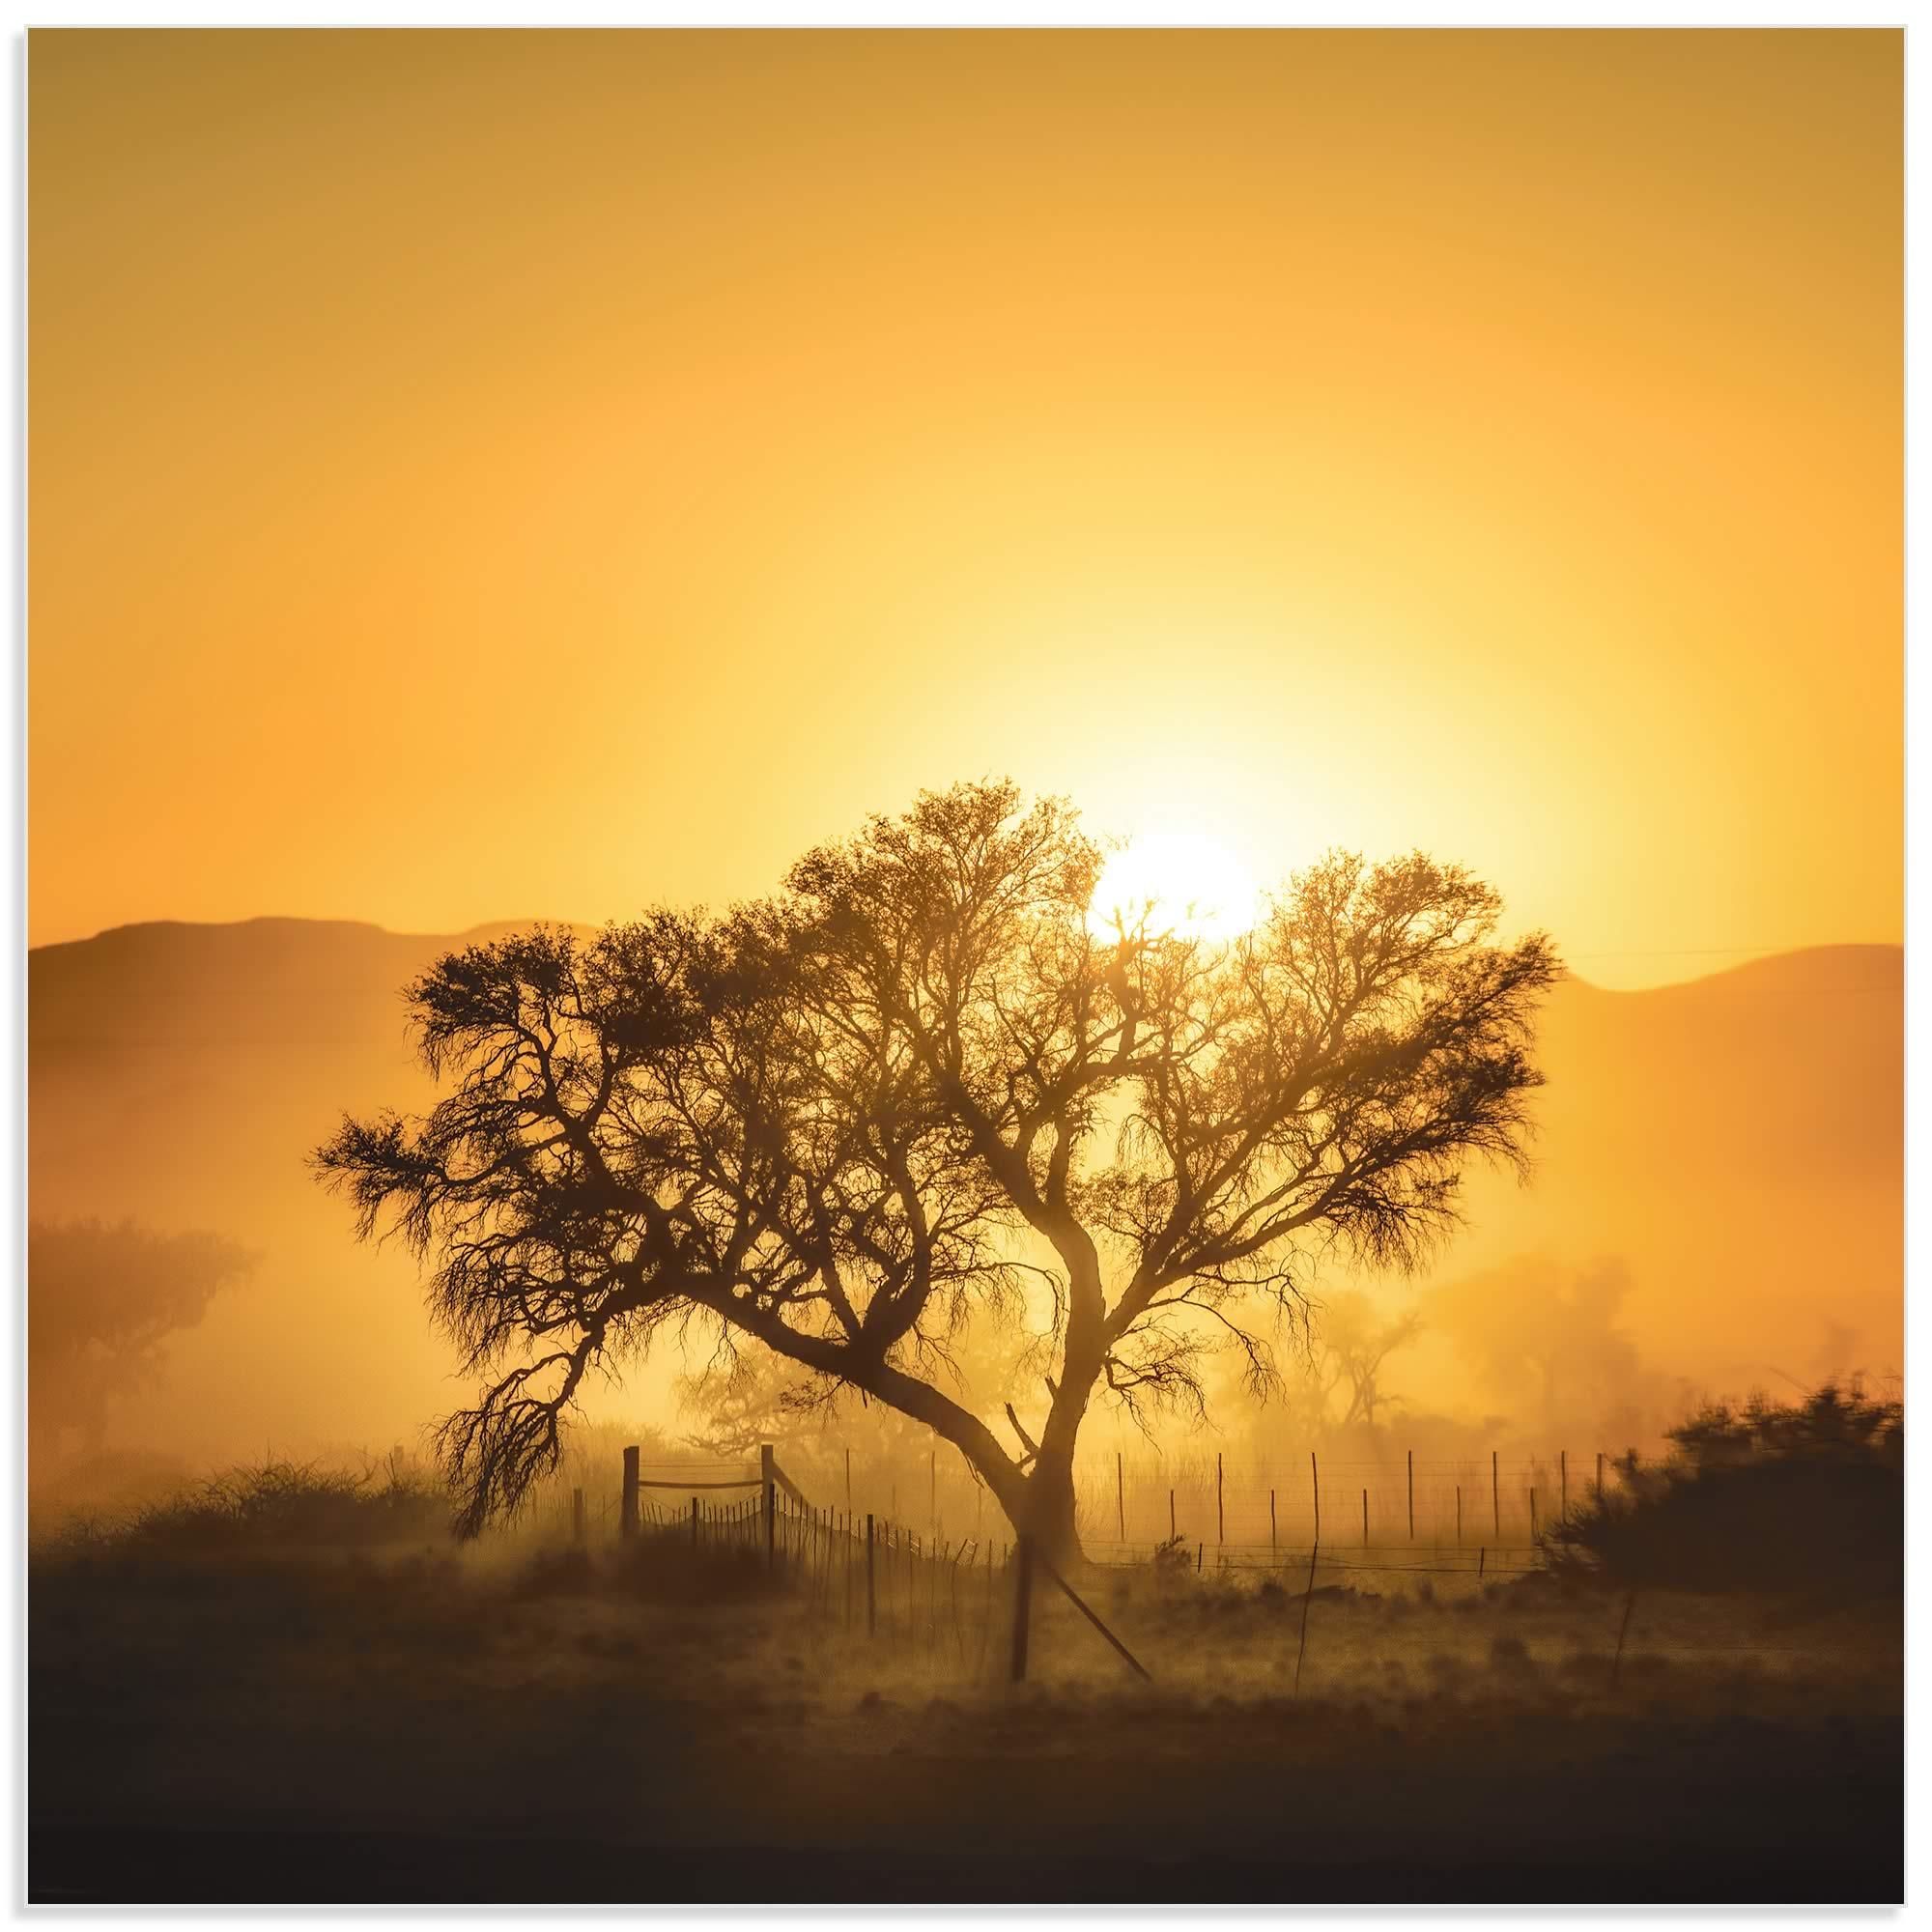 Golden Sunrise by Piet Flour - Landscape Photography on Metal or Acrylic - Alternate View 2